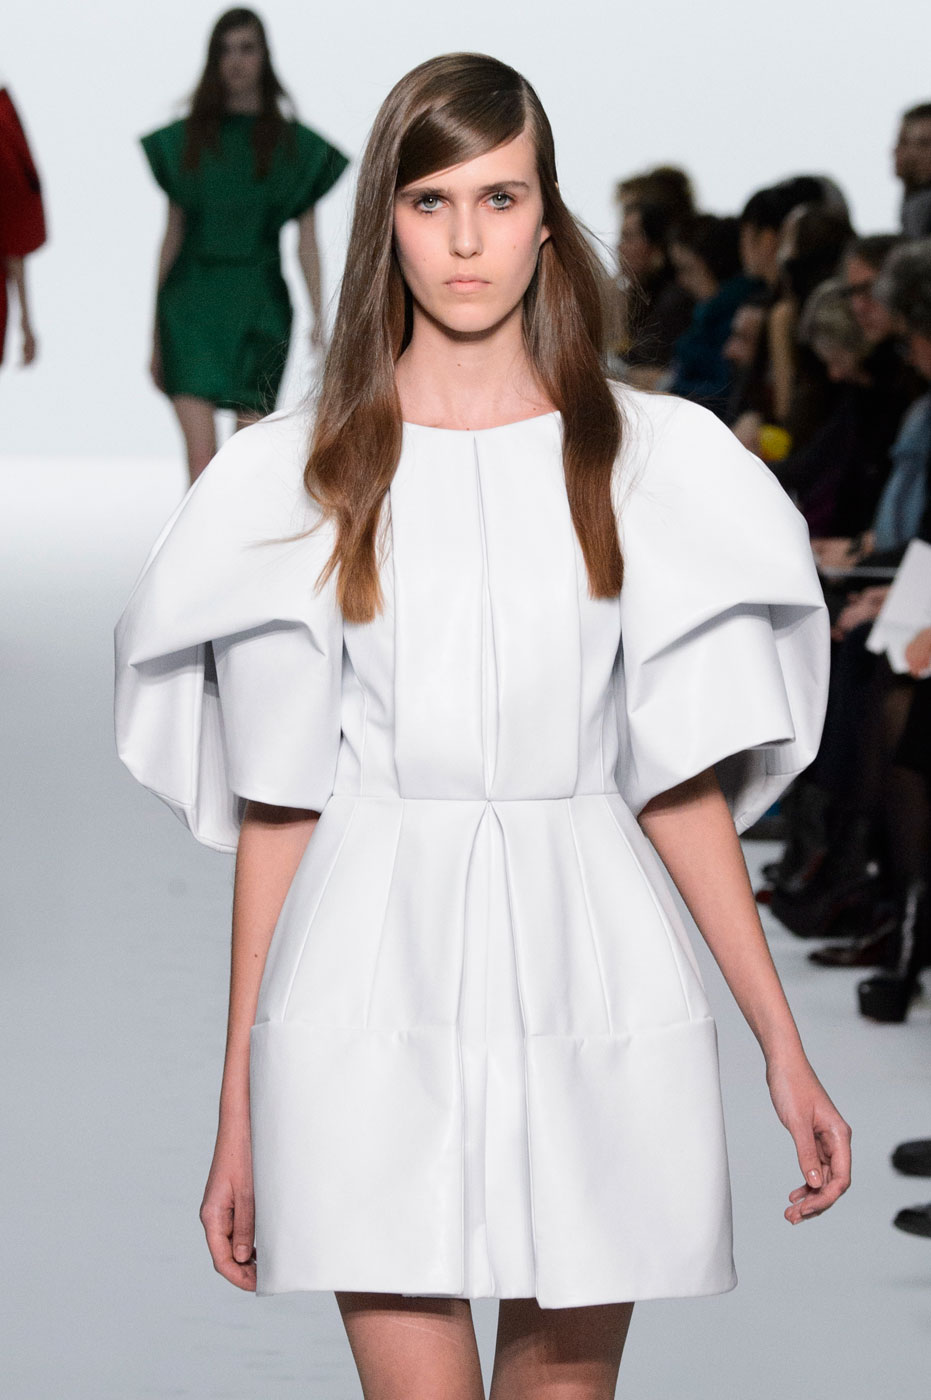 Kayek-fashion-runway-show-haute-couture-paris-spring-summer-2015-the-impression-30